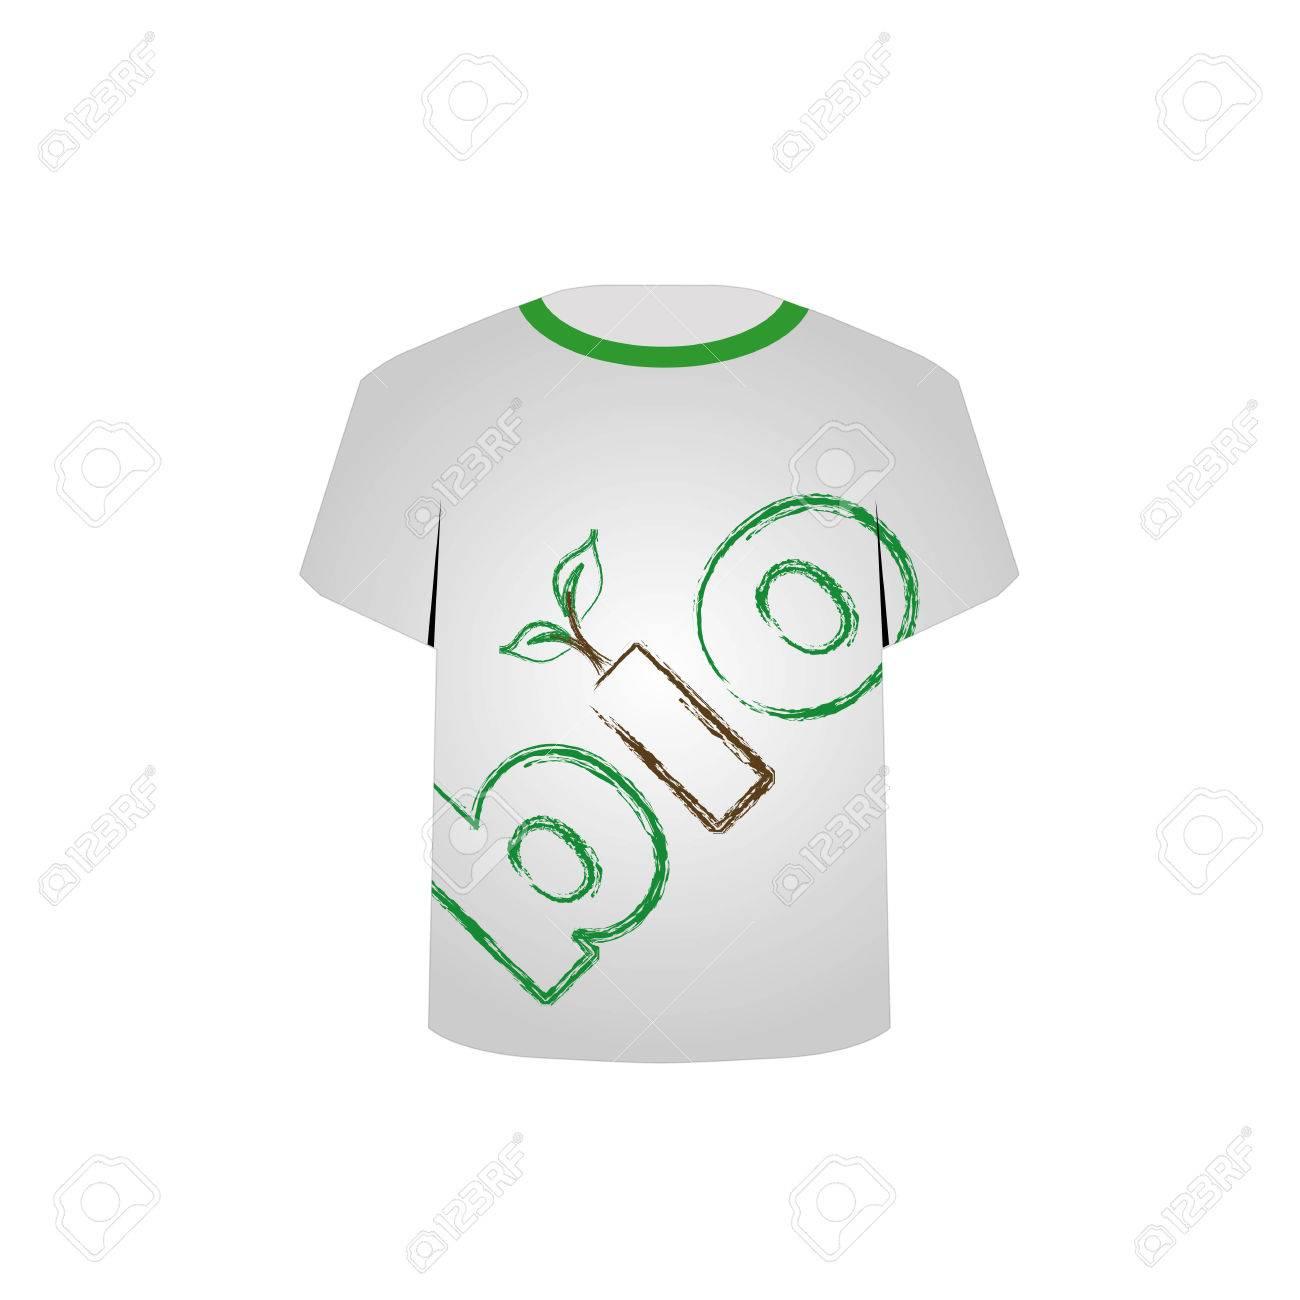 T Shirt Template- eco friendly design Stock Vector - 22719436